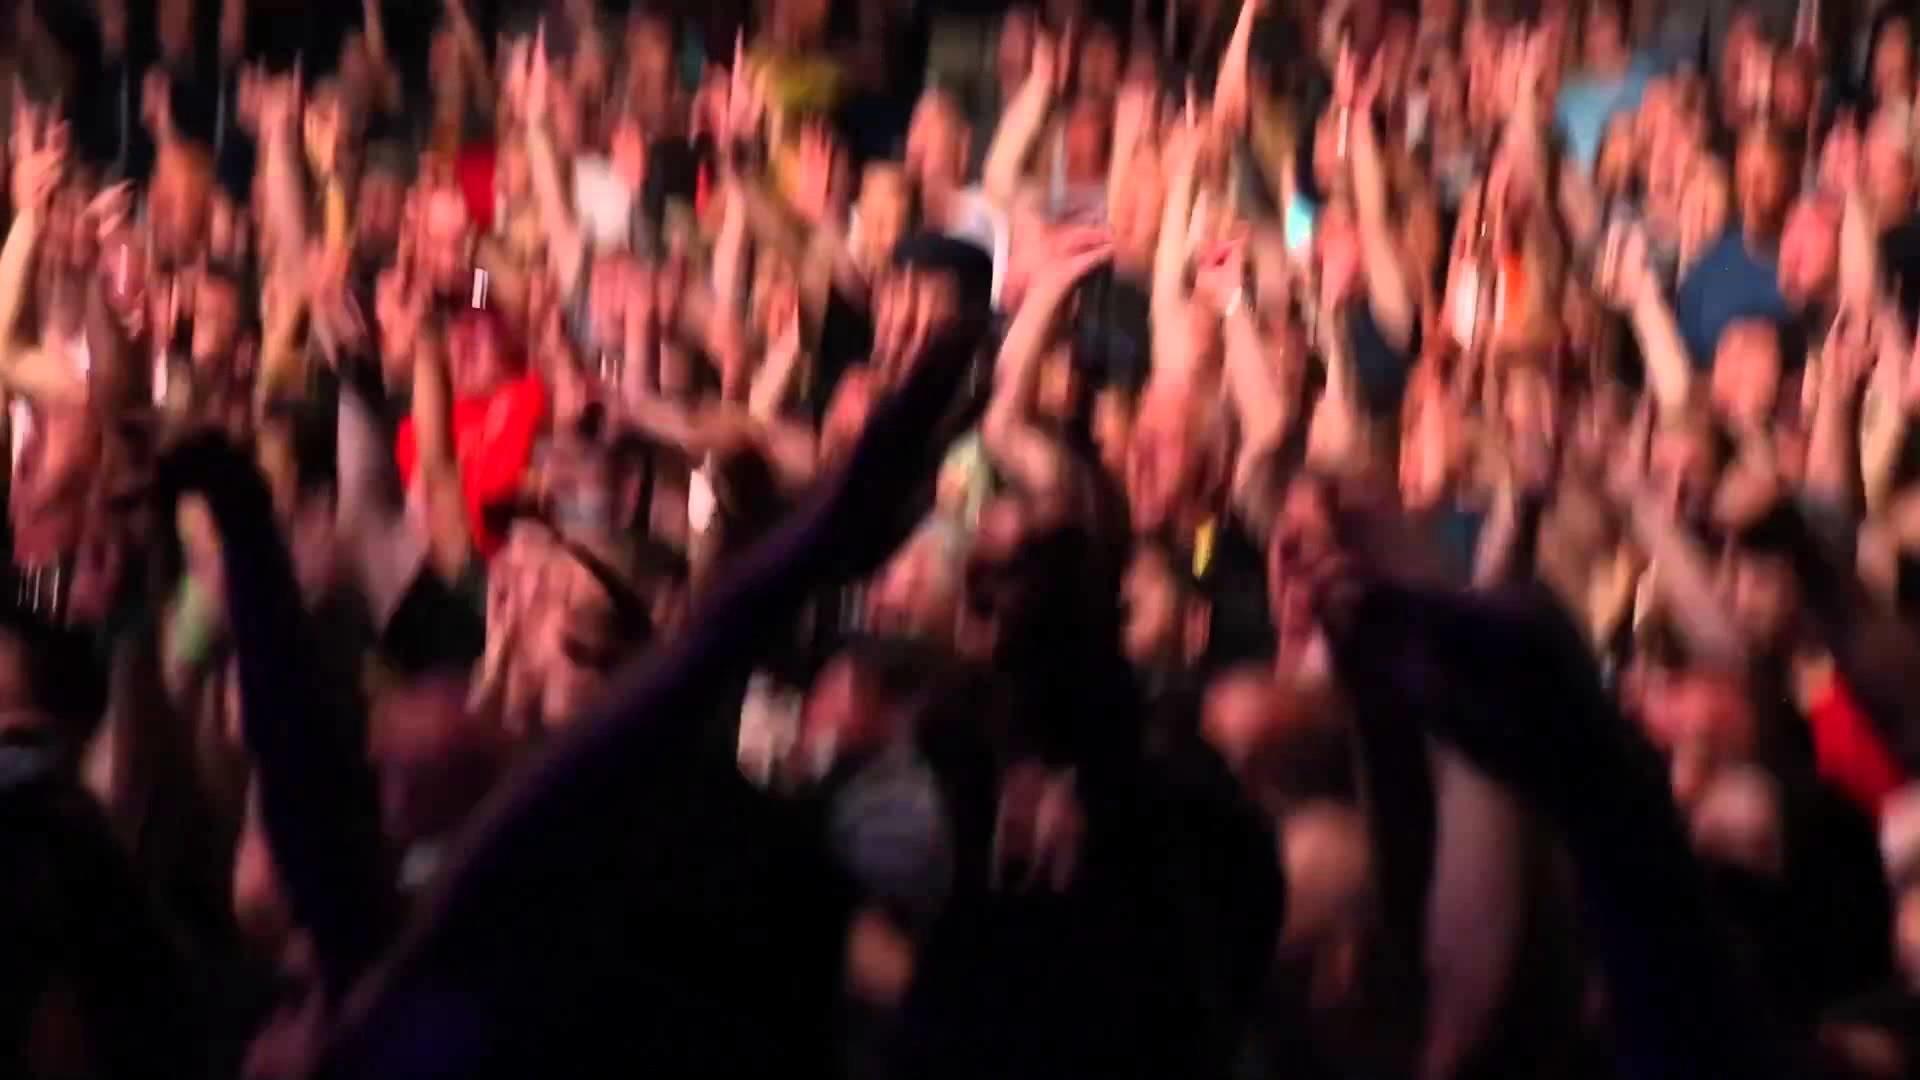 Res: 1920x1080, GODSMACK: FALL 2015 TOUR PROMO